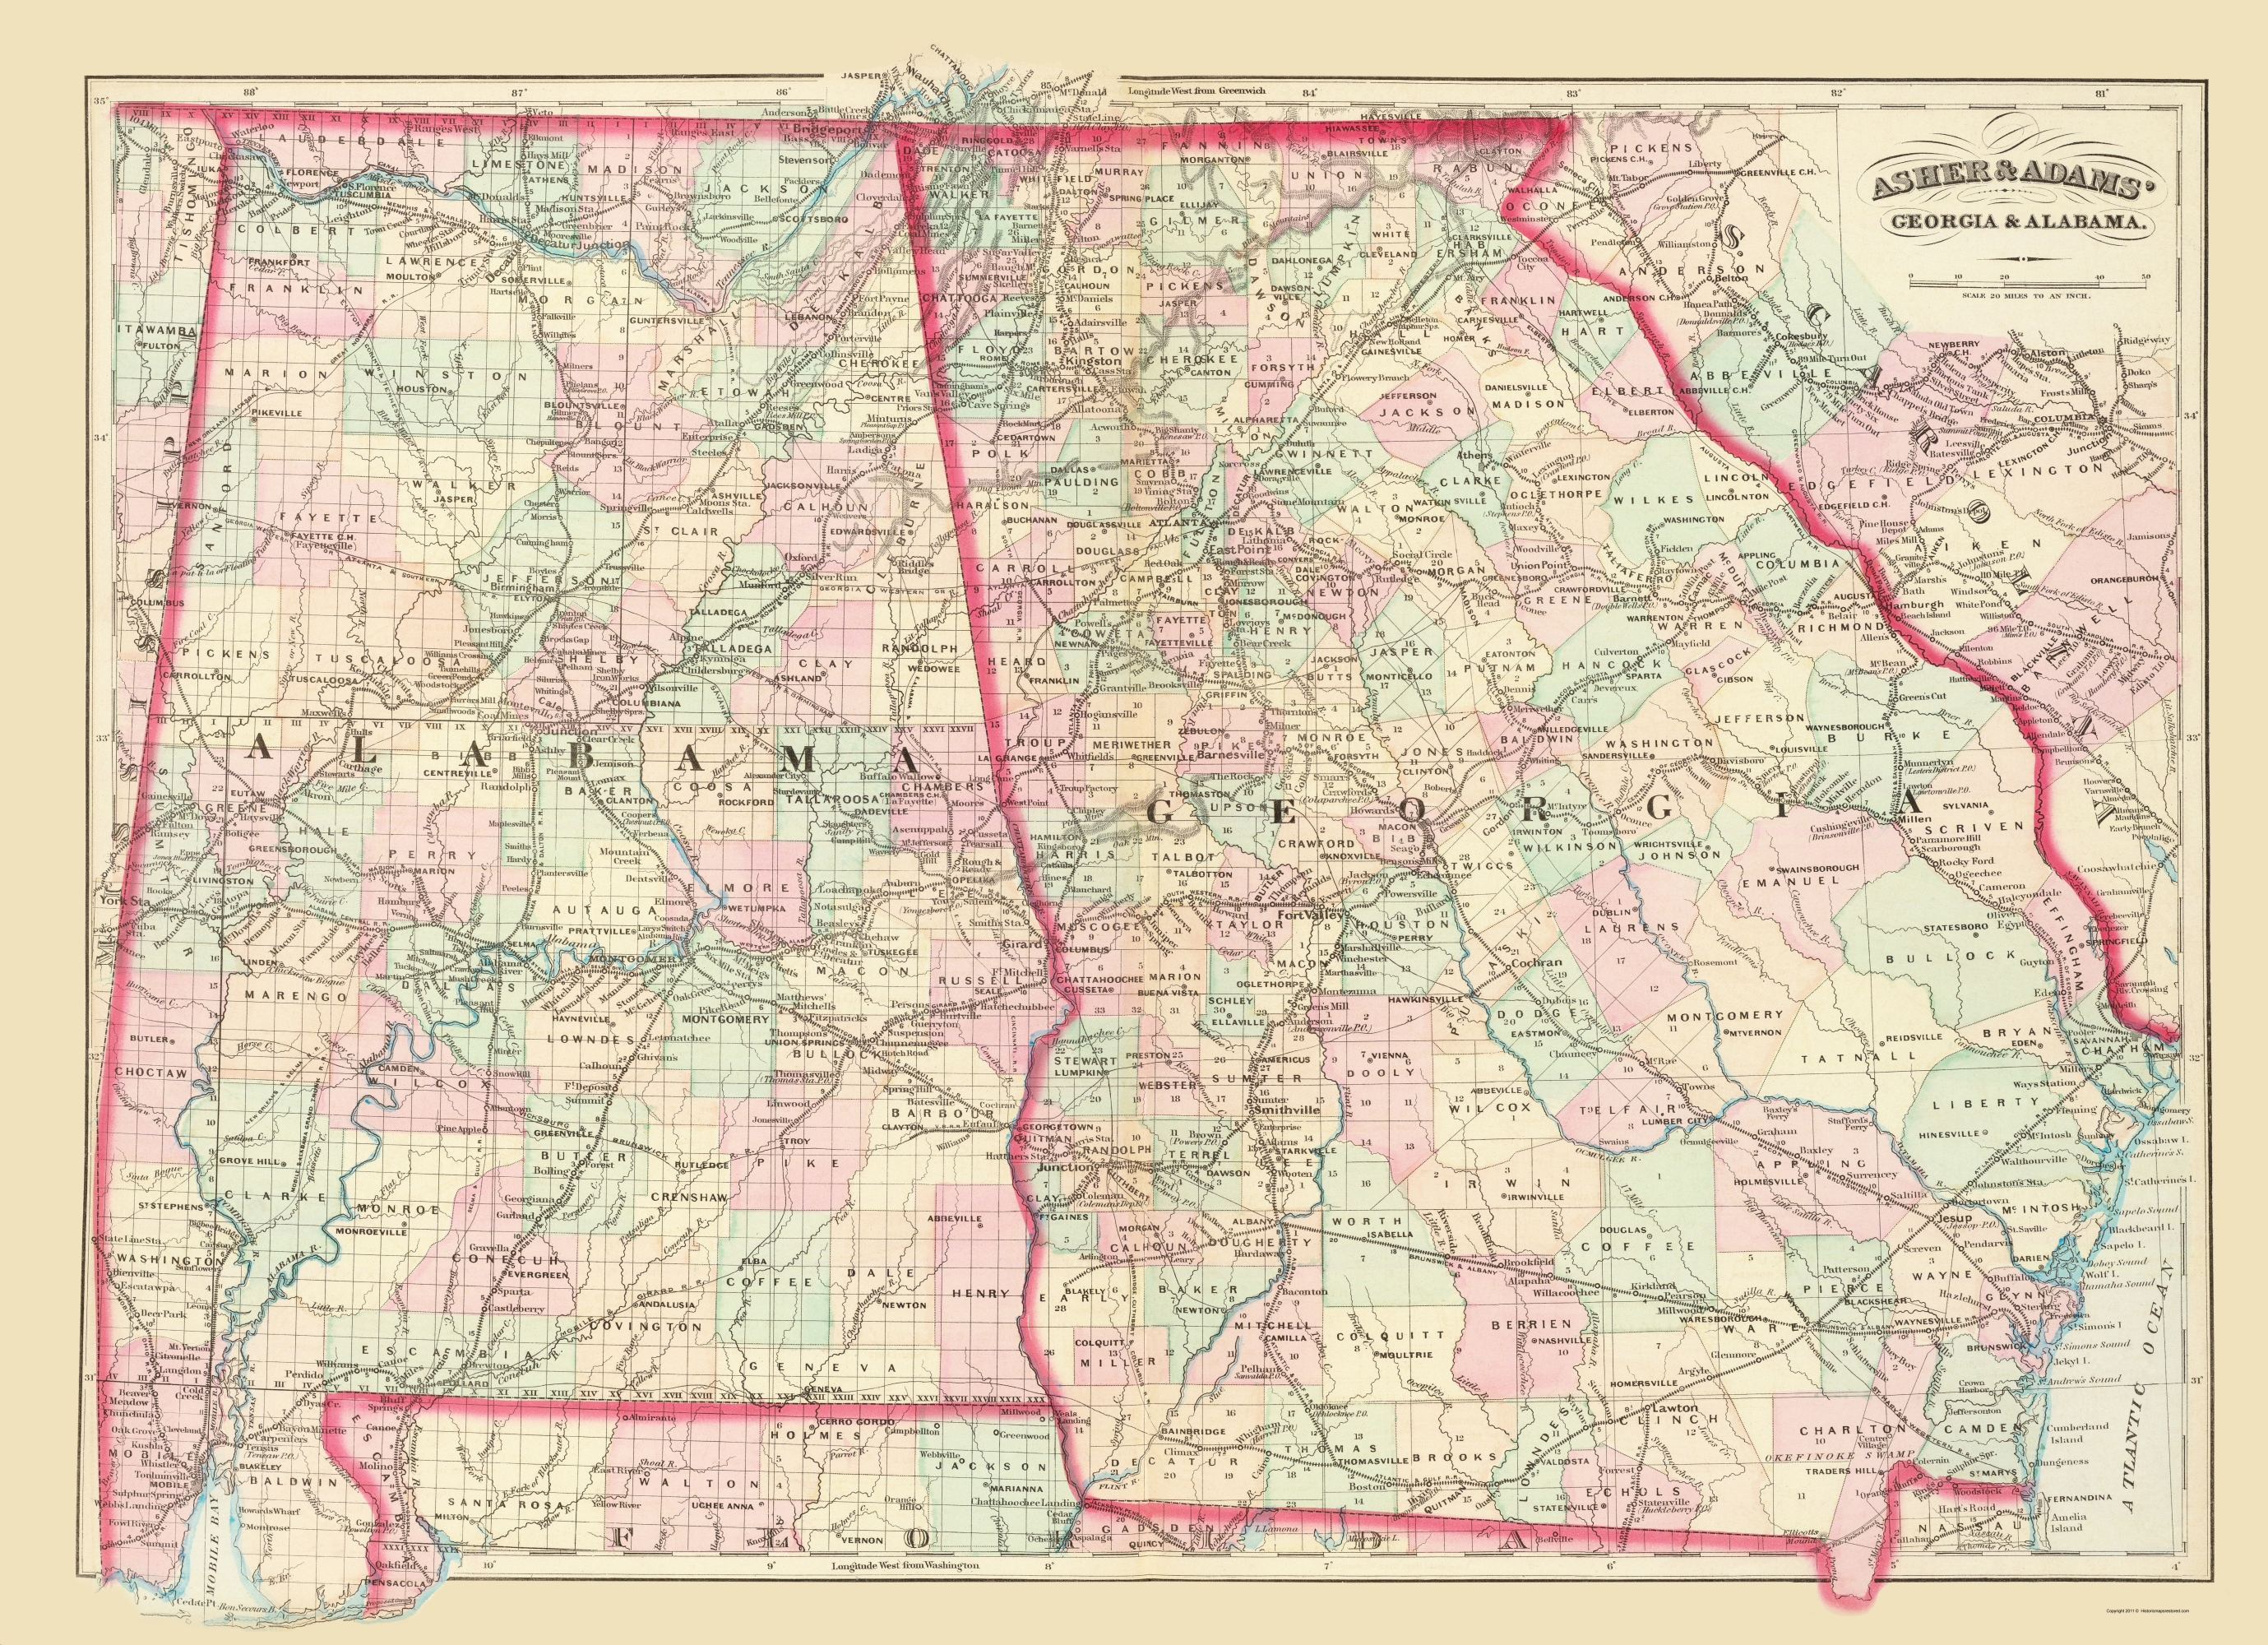 Map Of Georgia Alabama.Old State Map Georgia Alabama Asher 1874 23 X 31 72